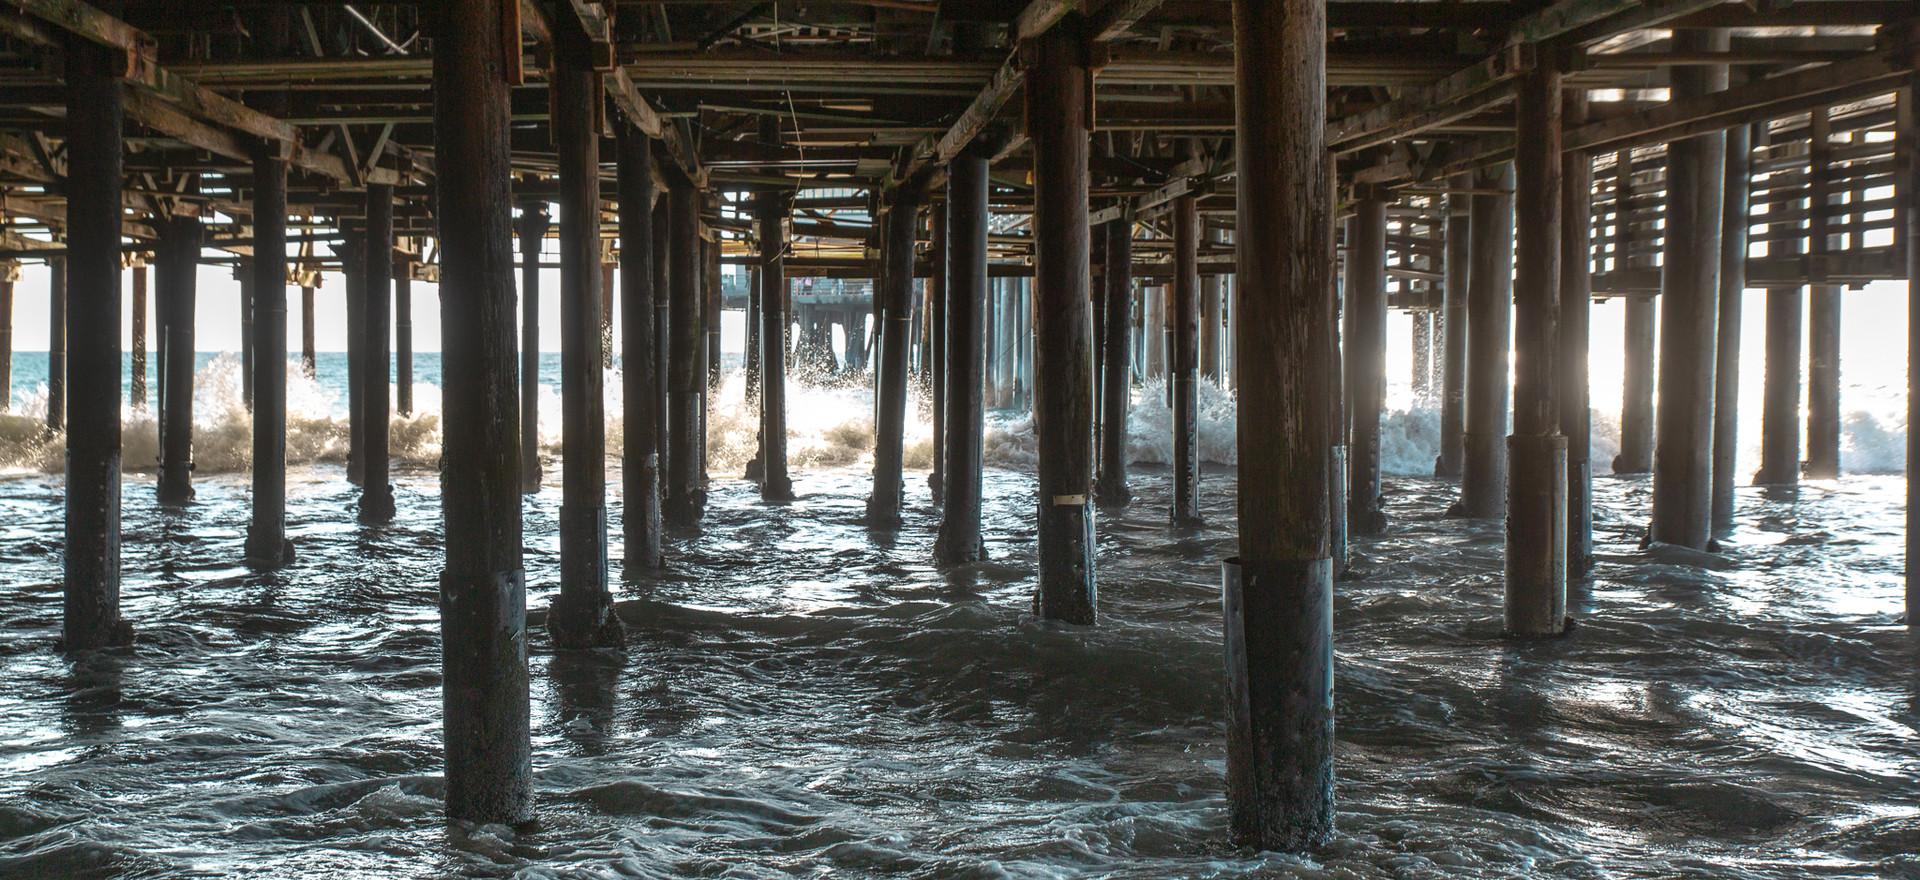 Califfornia, Santa Monica Pier